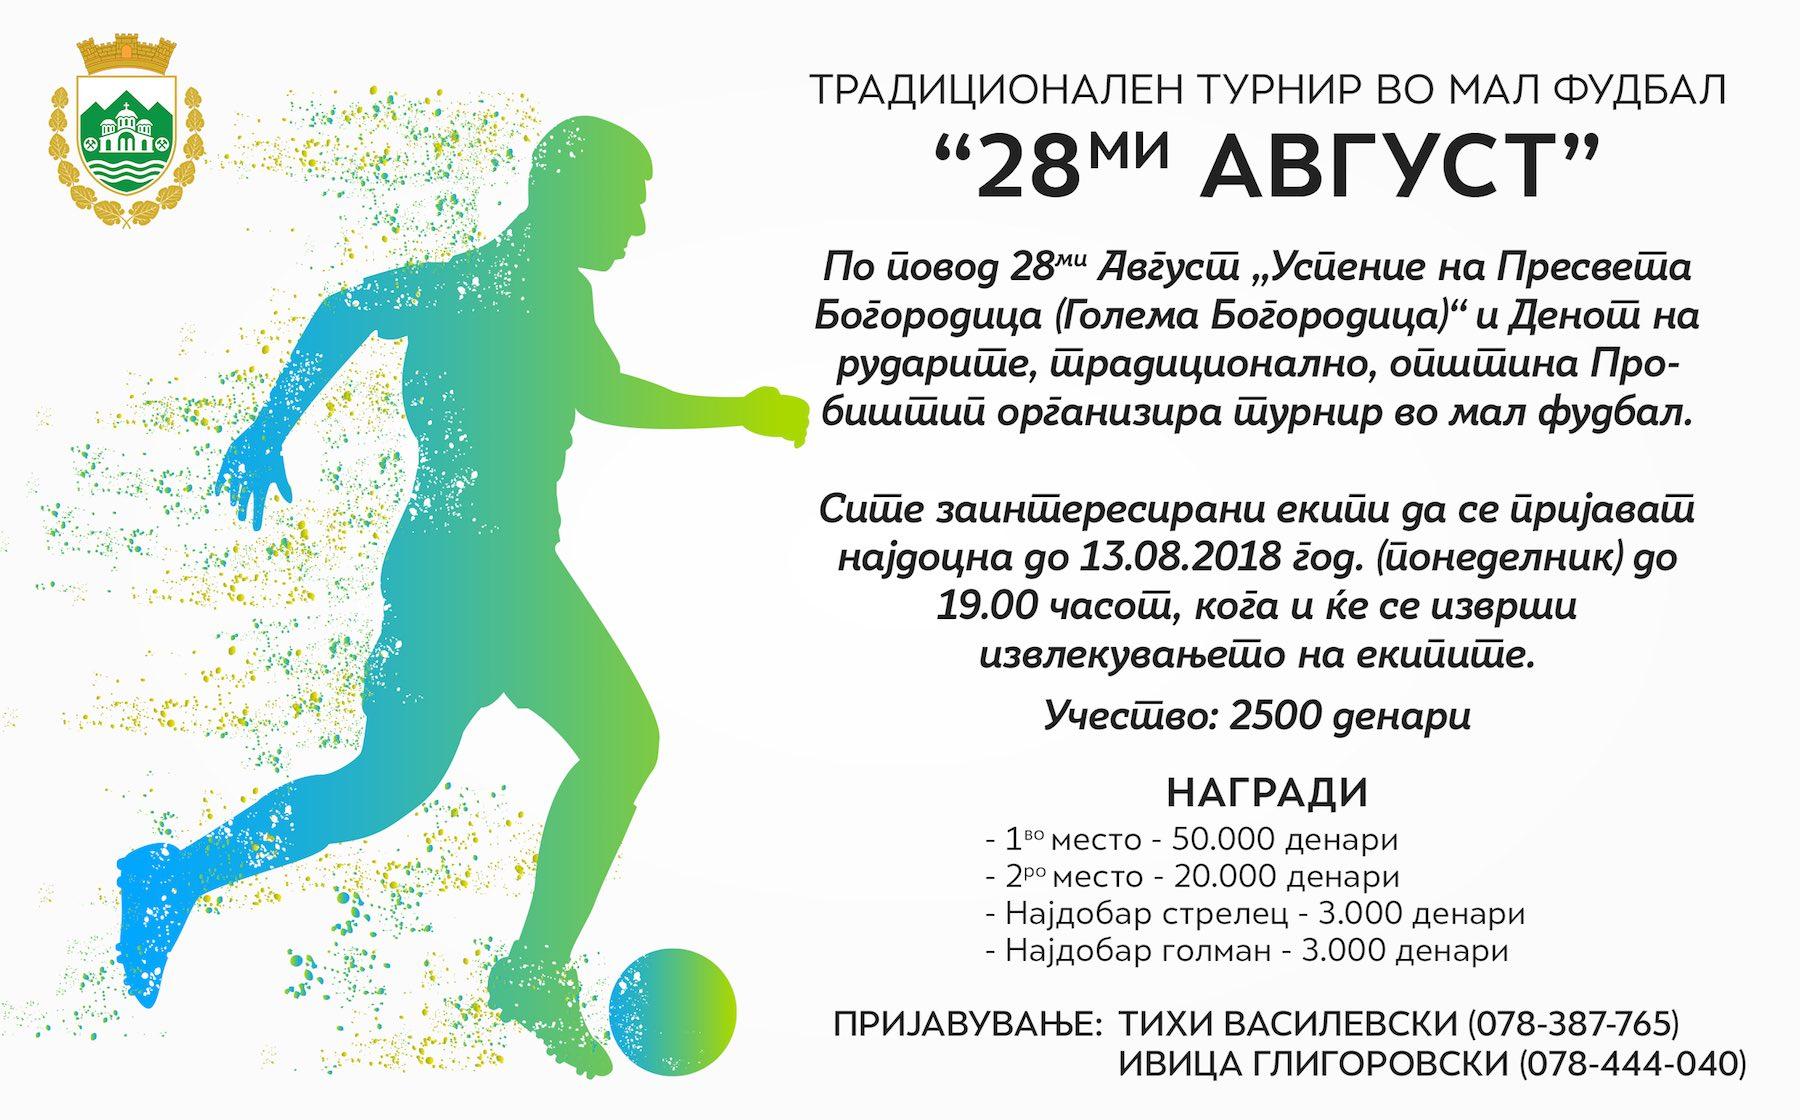 turnir fudbal probistip 2018